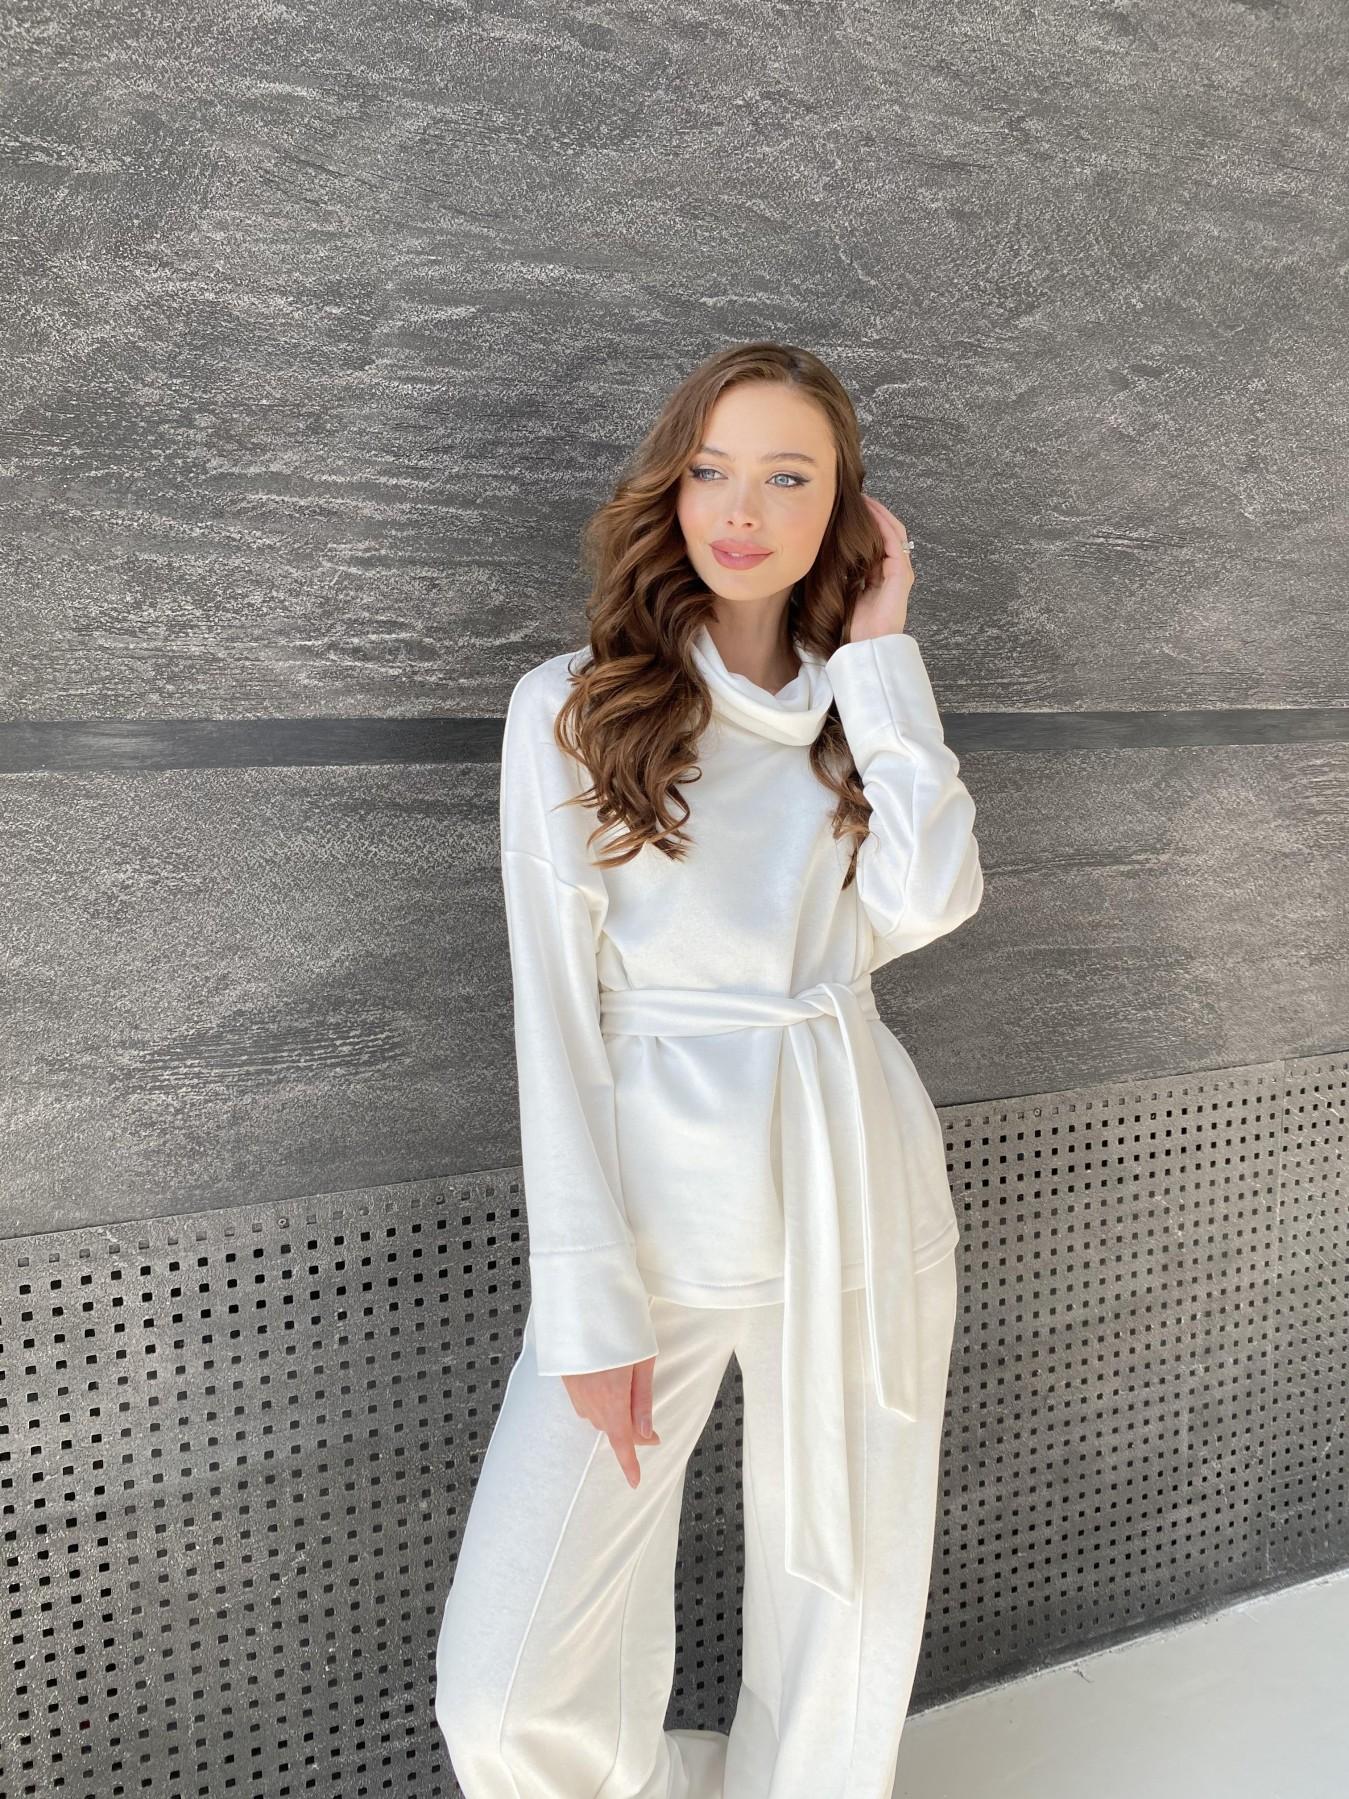 Джаст костюм Oversize  3х нитка 10564 АРТ. 47240 Цвет: Молоко - фото 8, интернет магазин tm-modus.ru